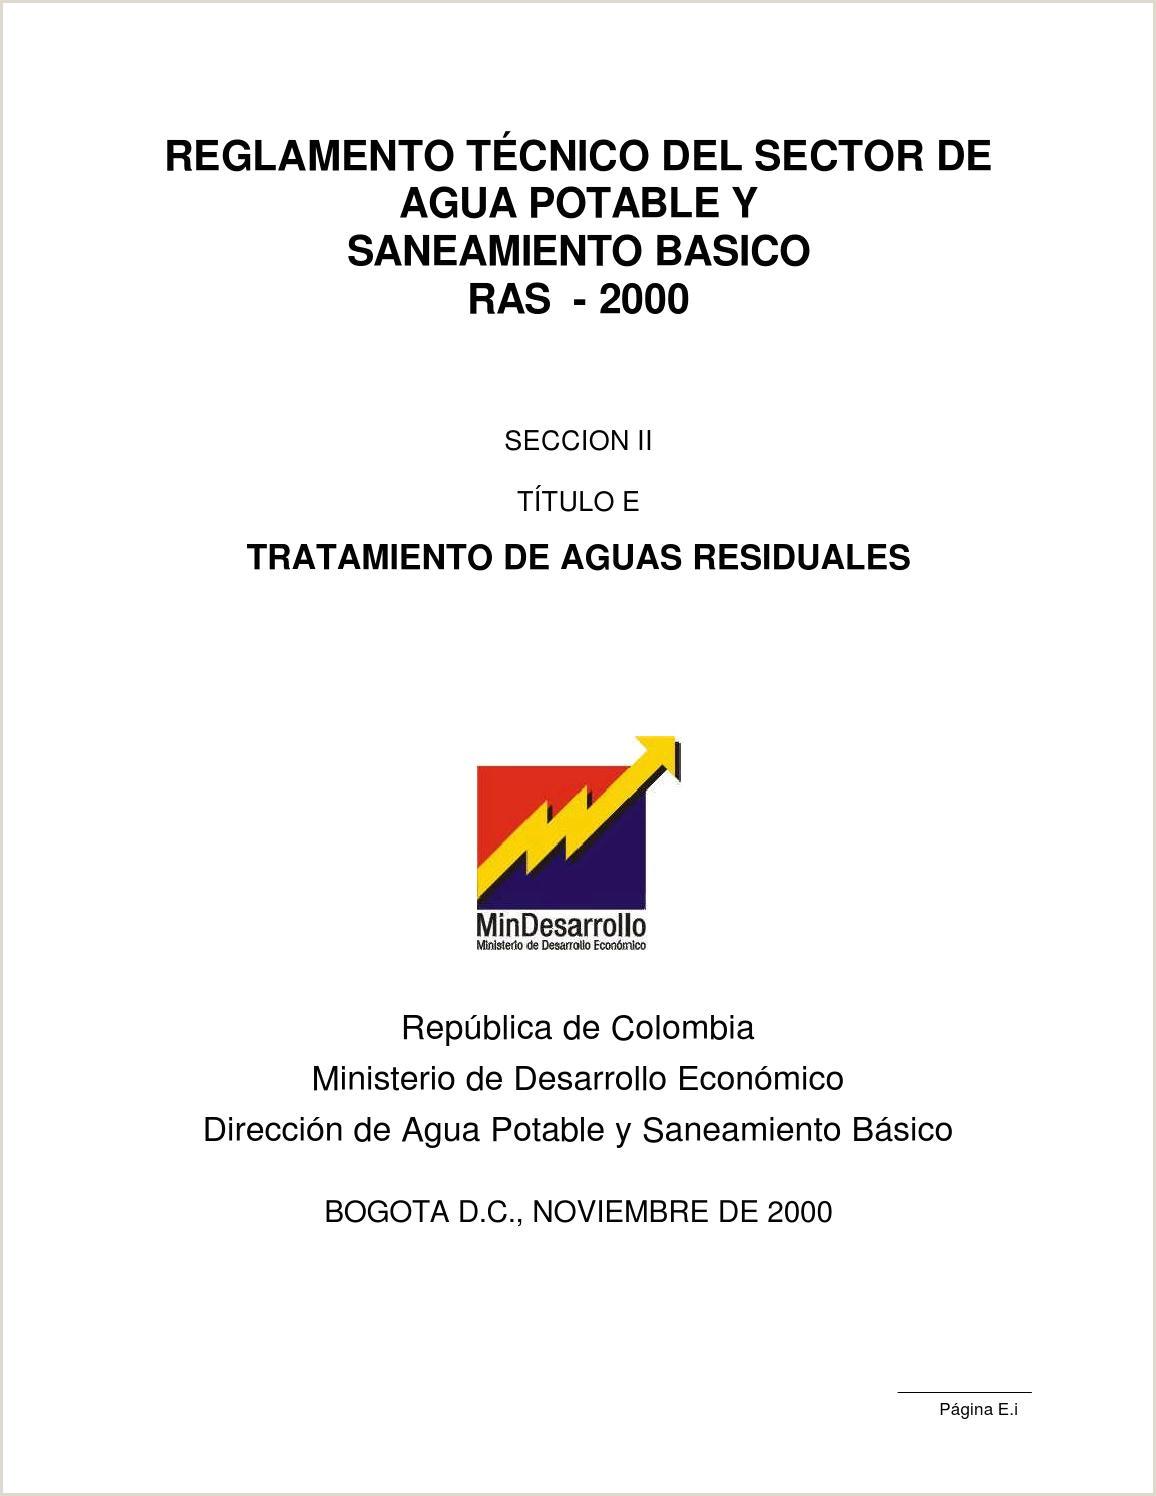 Formato De Hoja De Vida Gtc 185 7 Tratamiento De Aguas Residuales by Stefania Trivi±o issuu